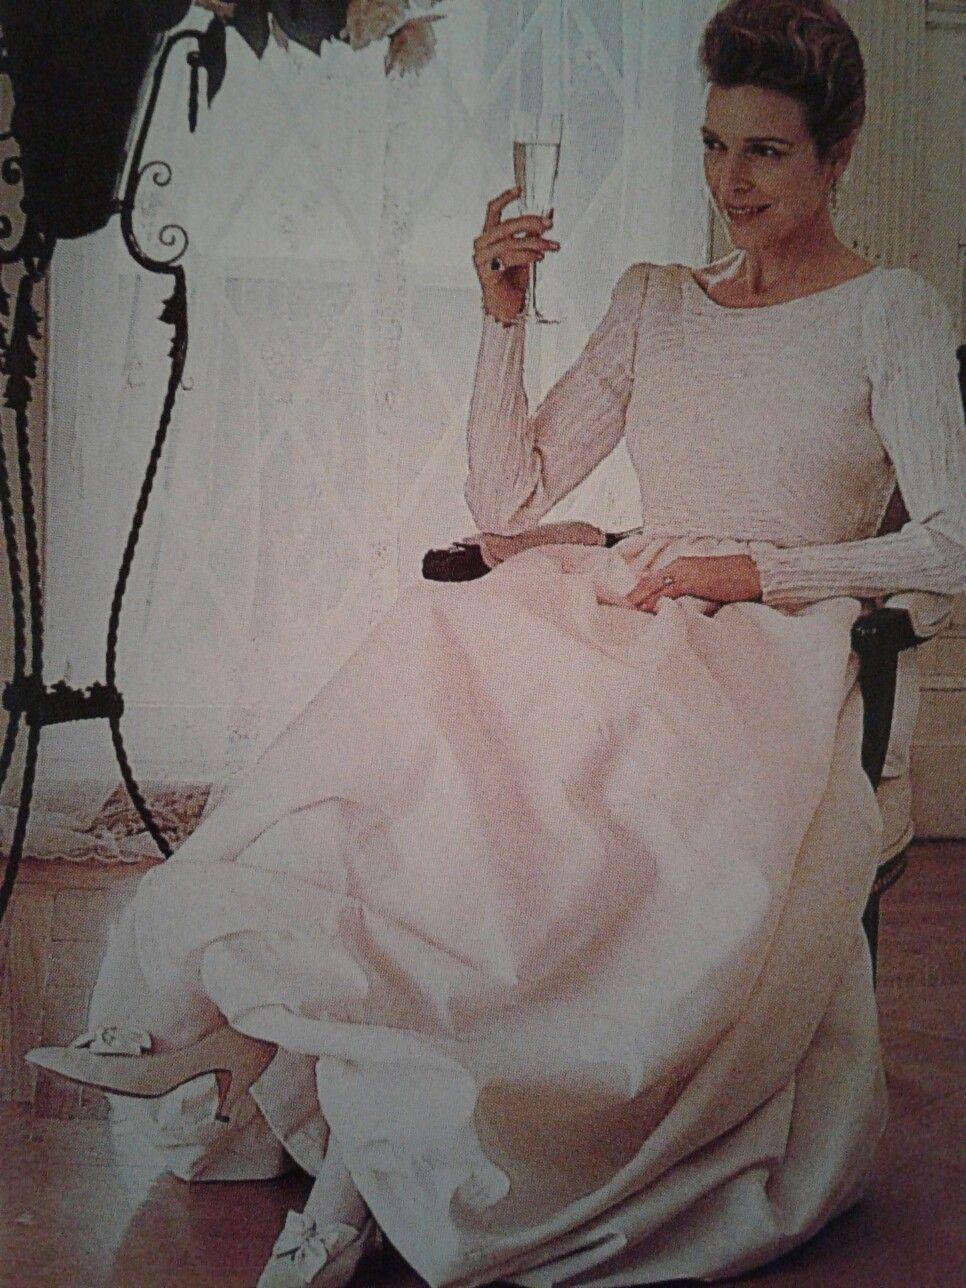 Victoria magazine June 92'